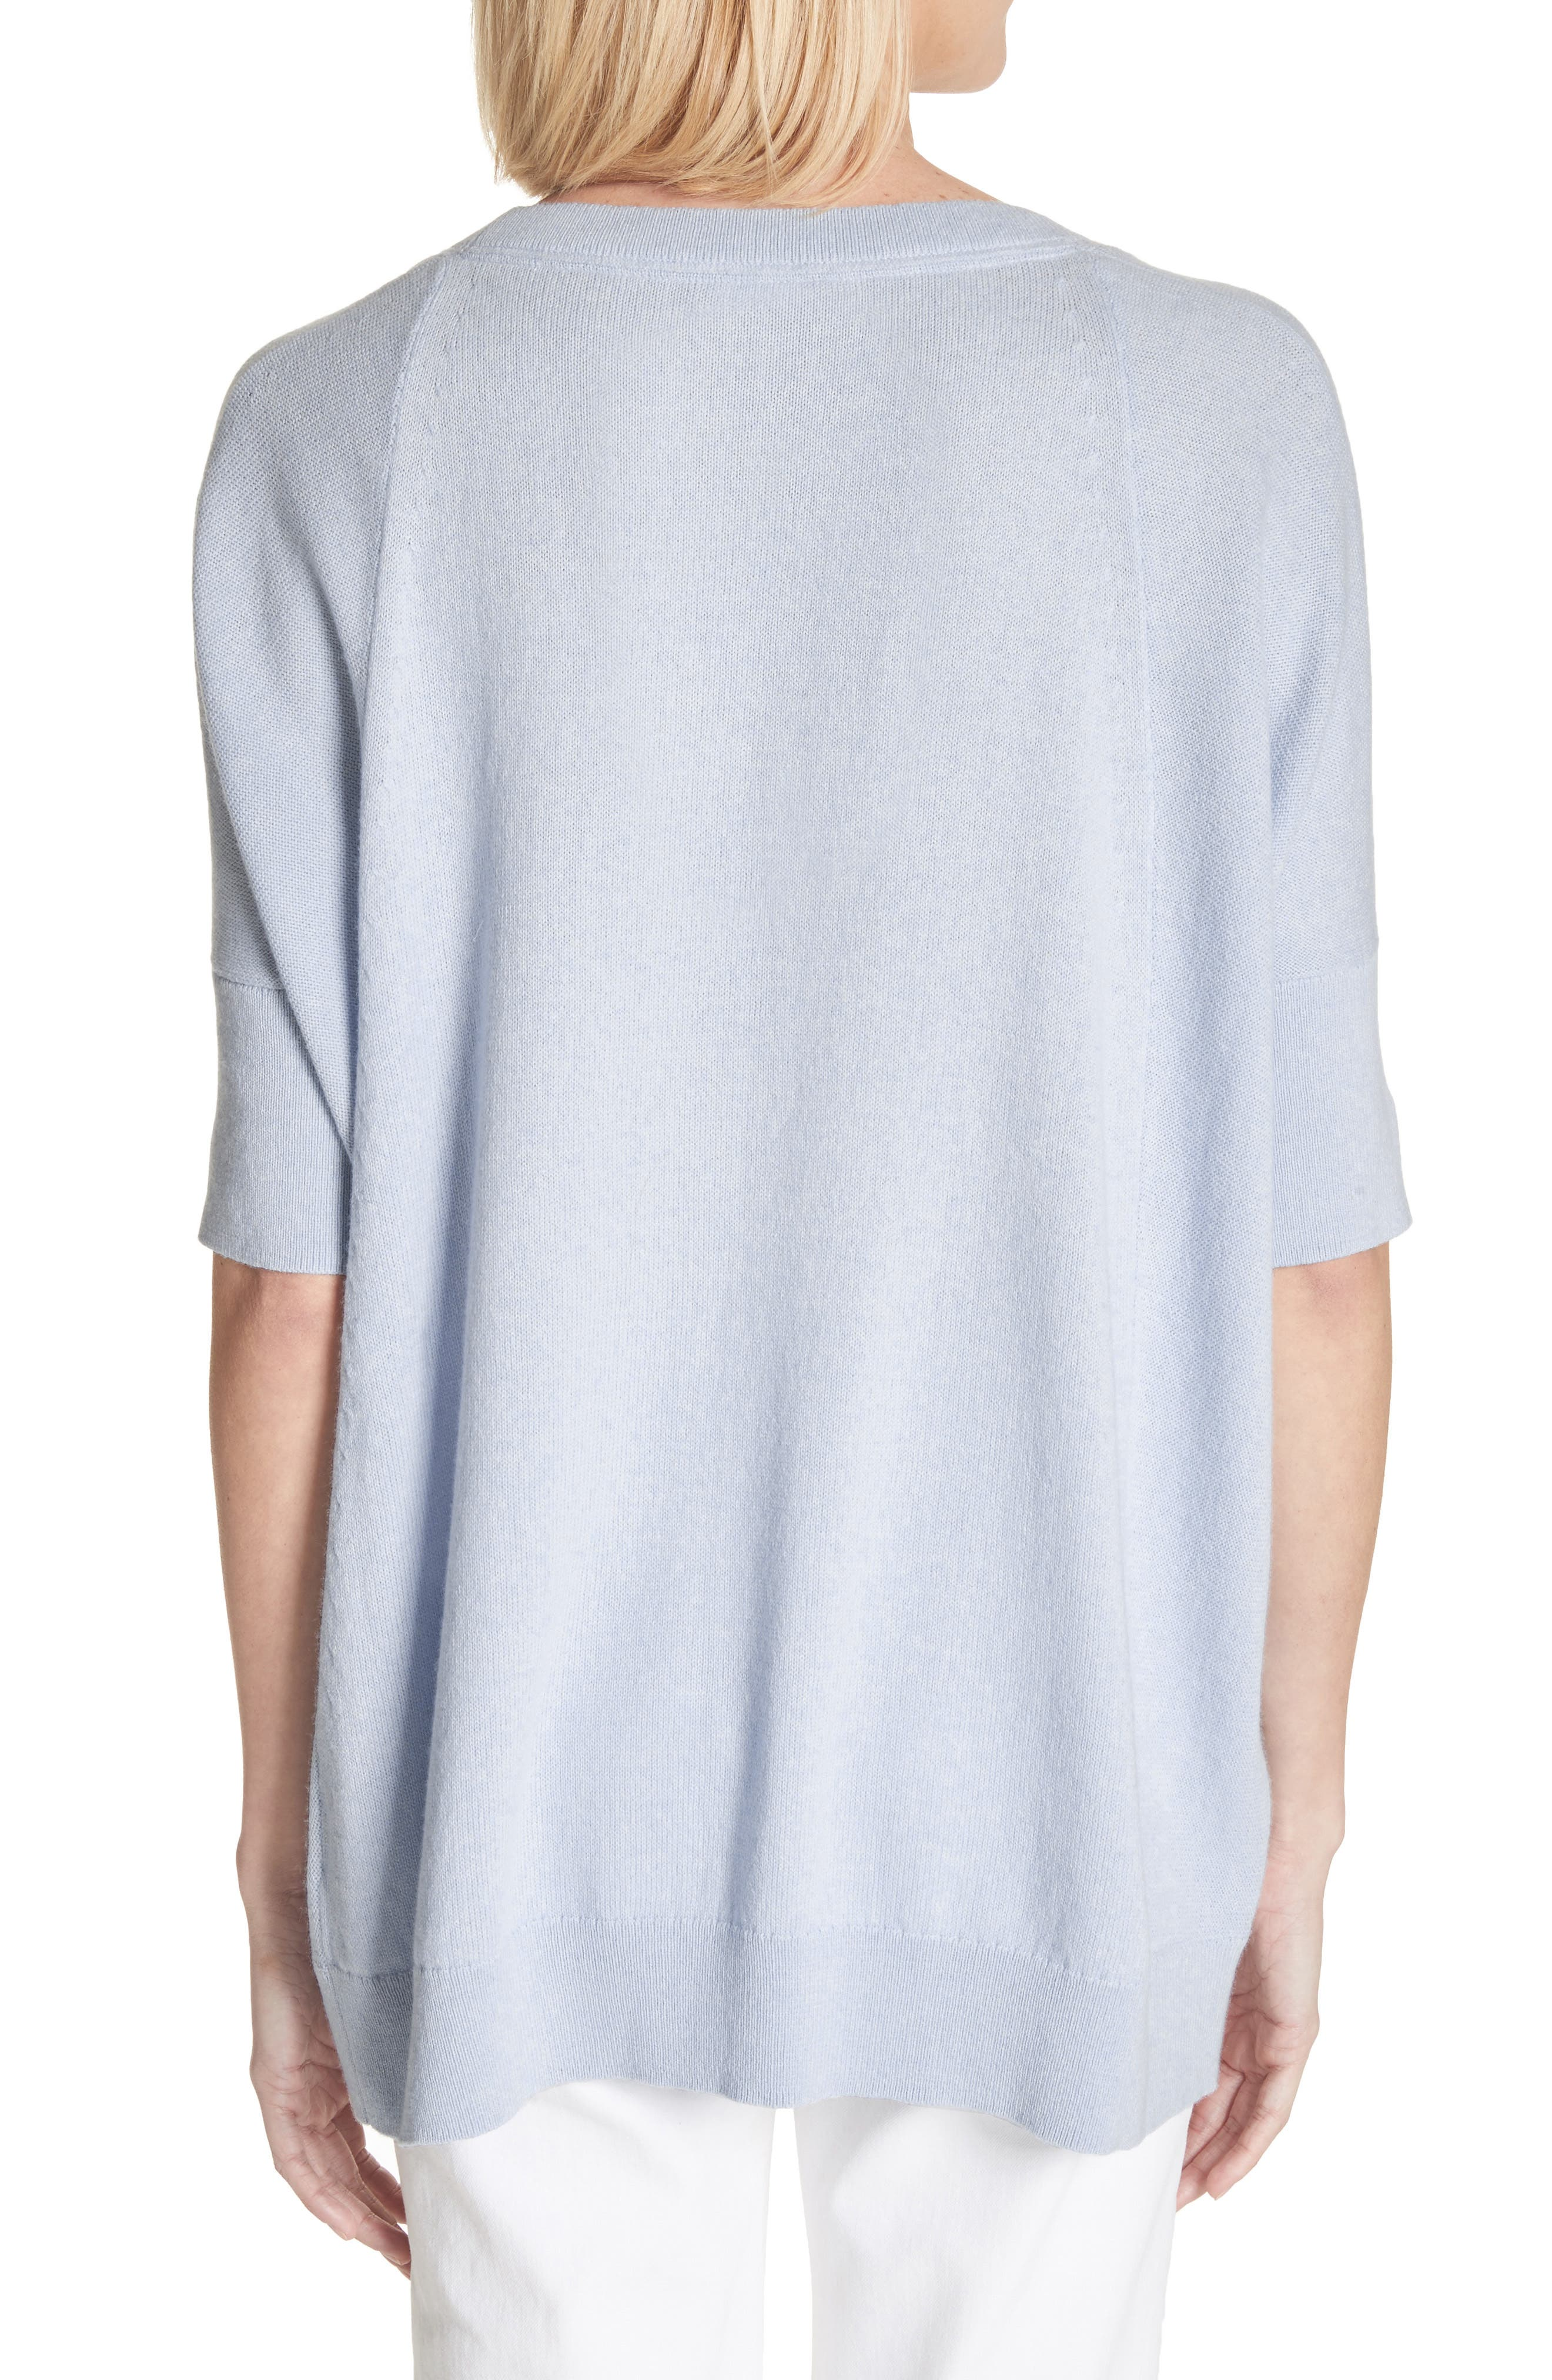 Cotton, Cashmere & Silk Oversized Scoop Neck Sweater,                             Alternate thumbnail 2, color,                             Pale Blue Melange